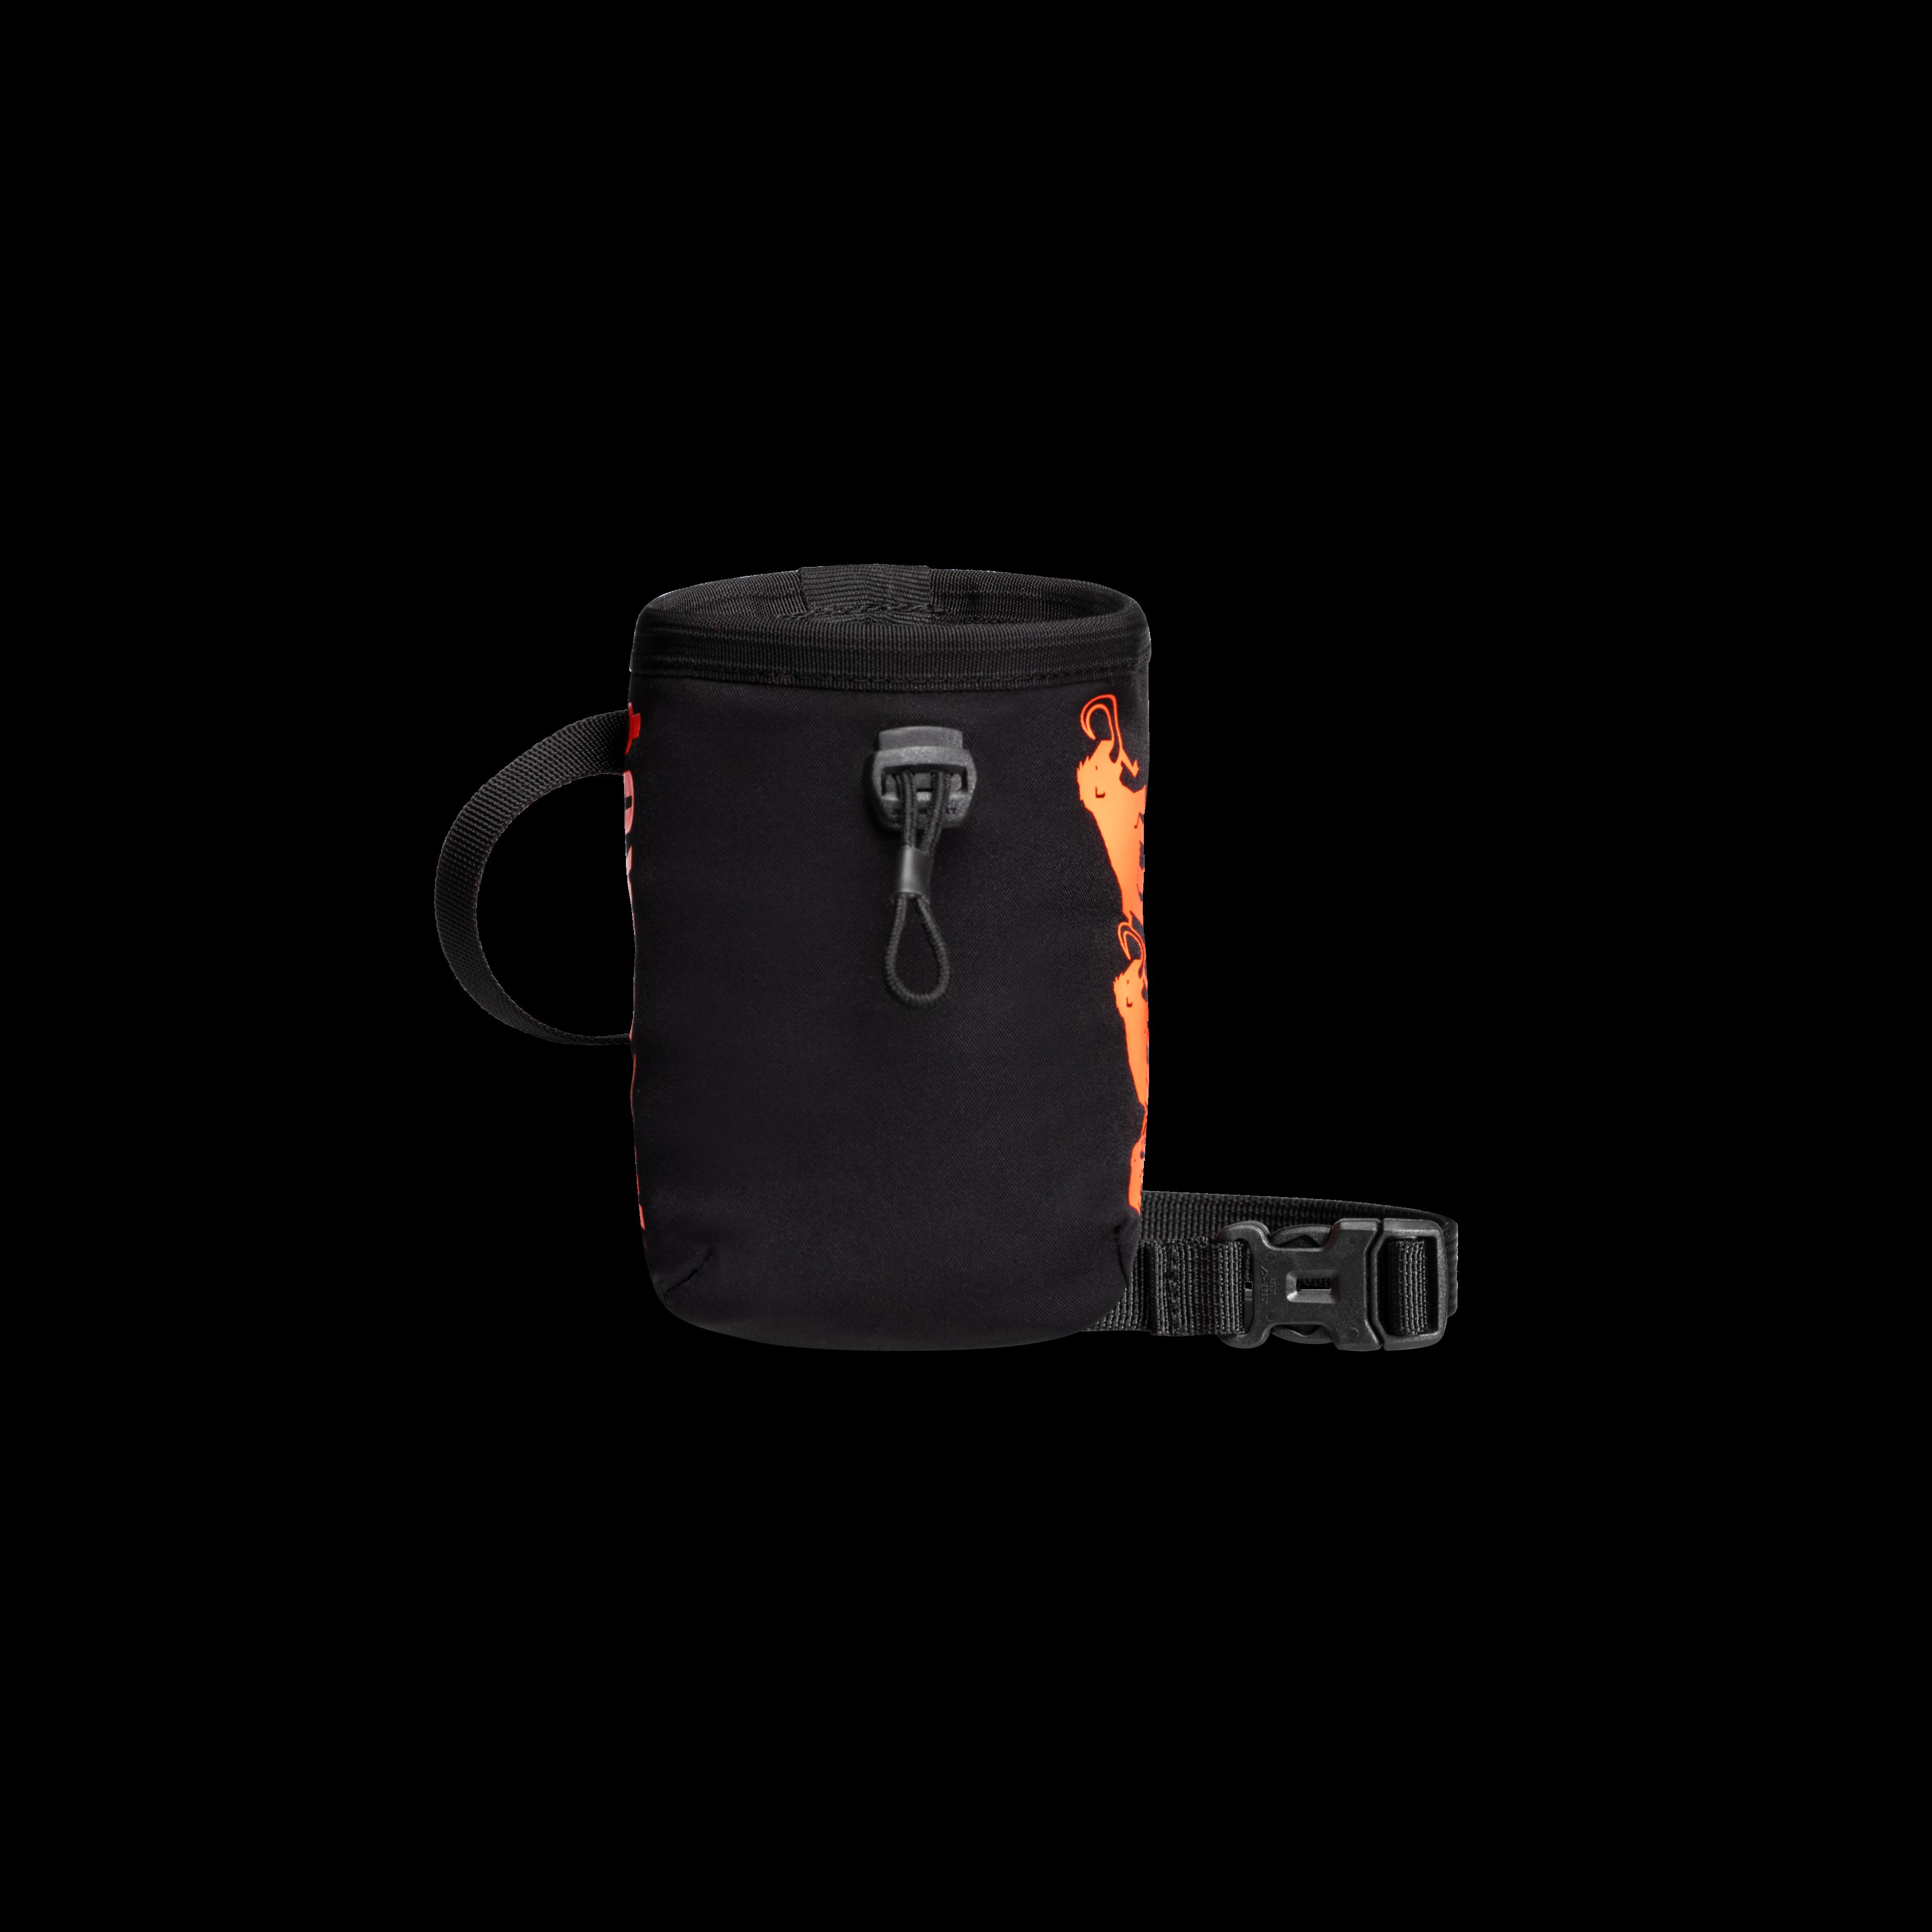 First Crag Chalk Bag - black, one size thumbnail